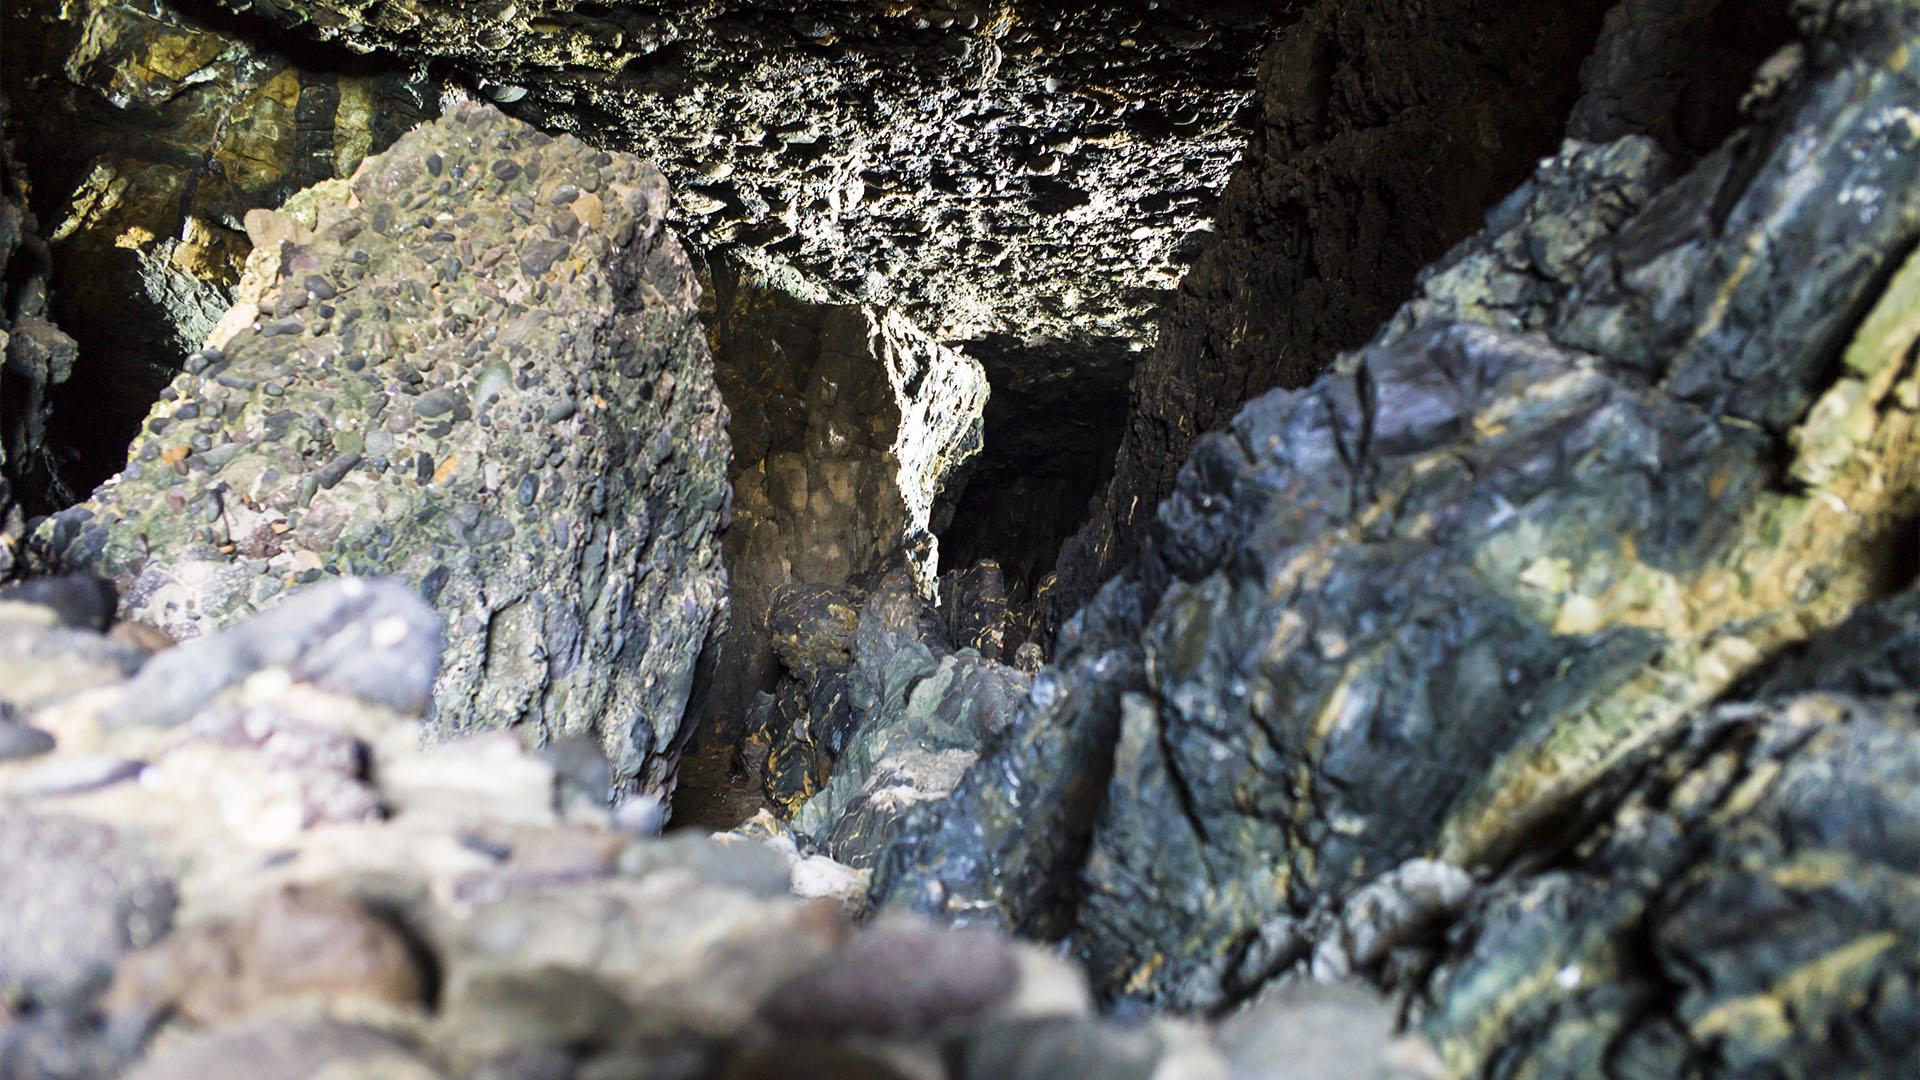 Sehenswürdigkeiten Fuerteventuras: Ajuy – Cuevas de Ajuy